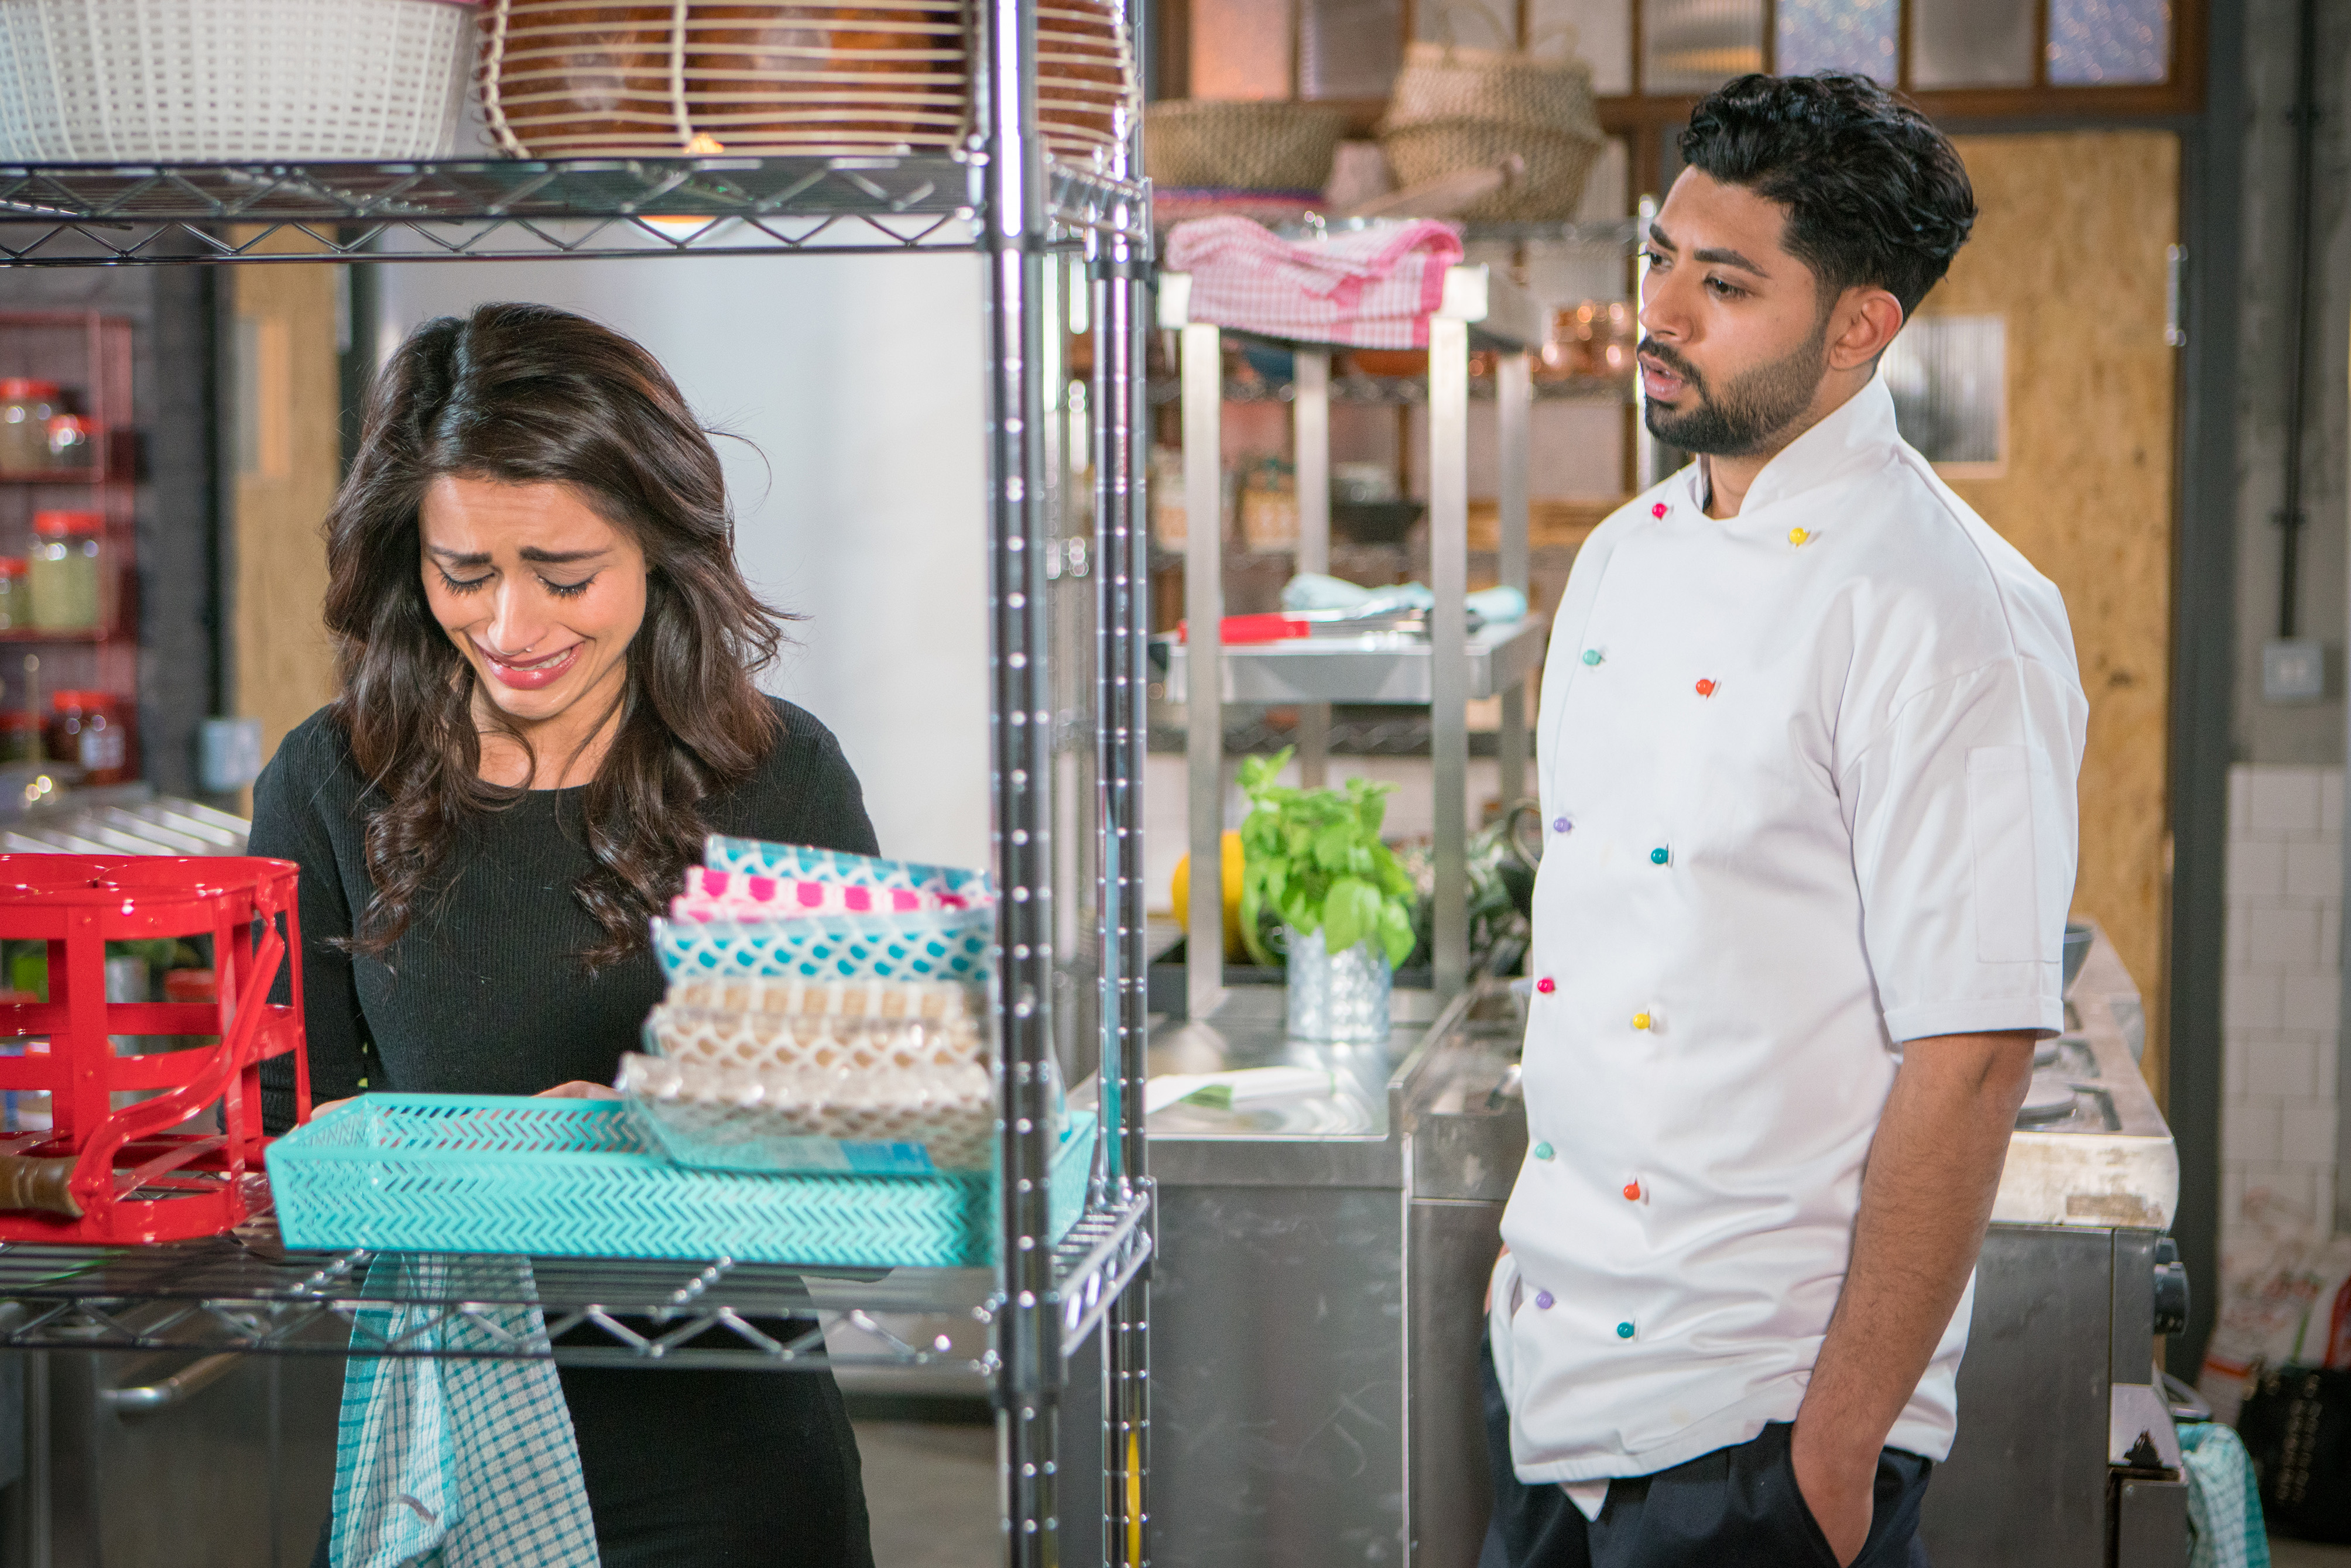 Zeedan and Rana argue in Coronation Street